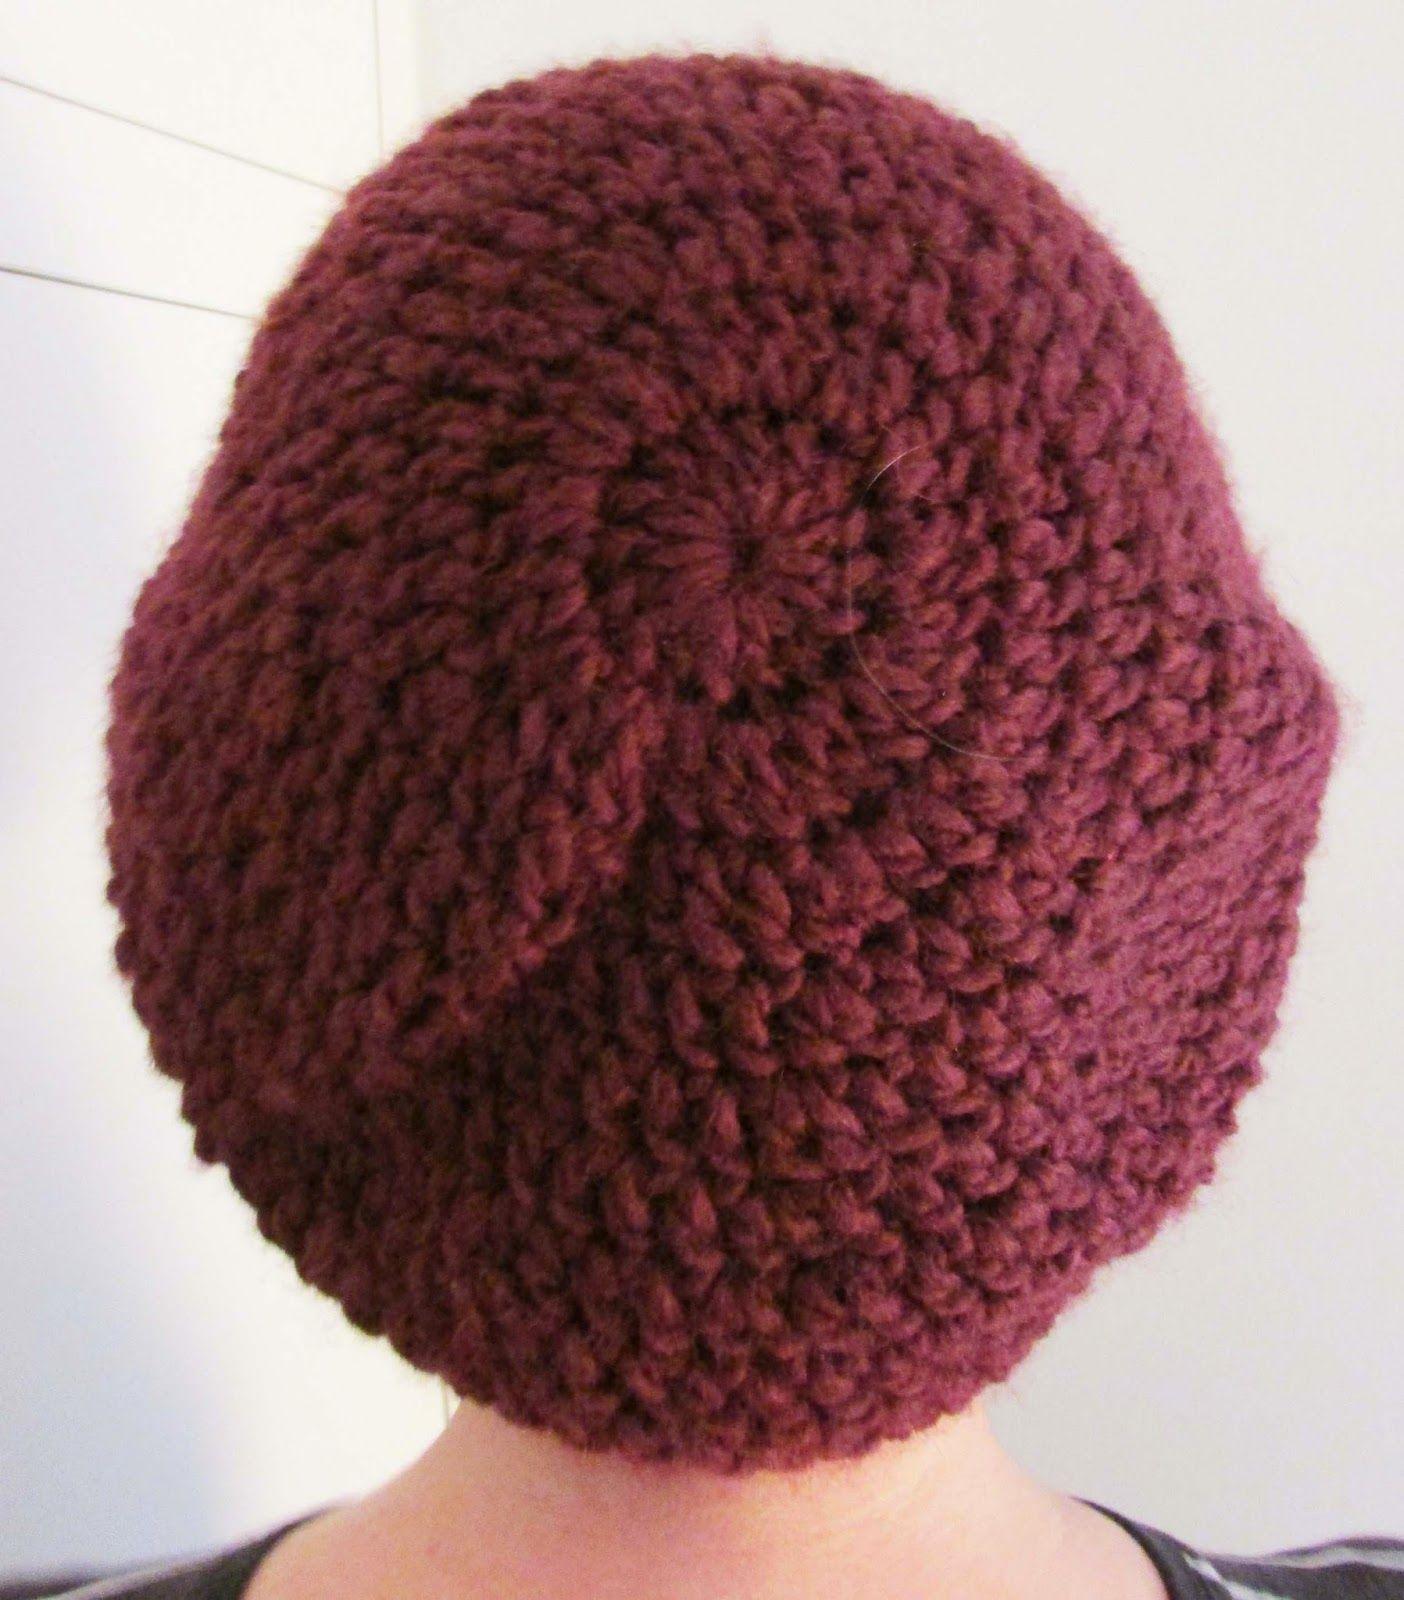 Lina\'s Land: Slouchy beret crochet pattern | Crochet | Pinterest ...